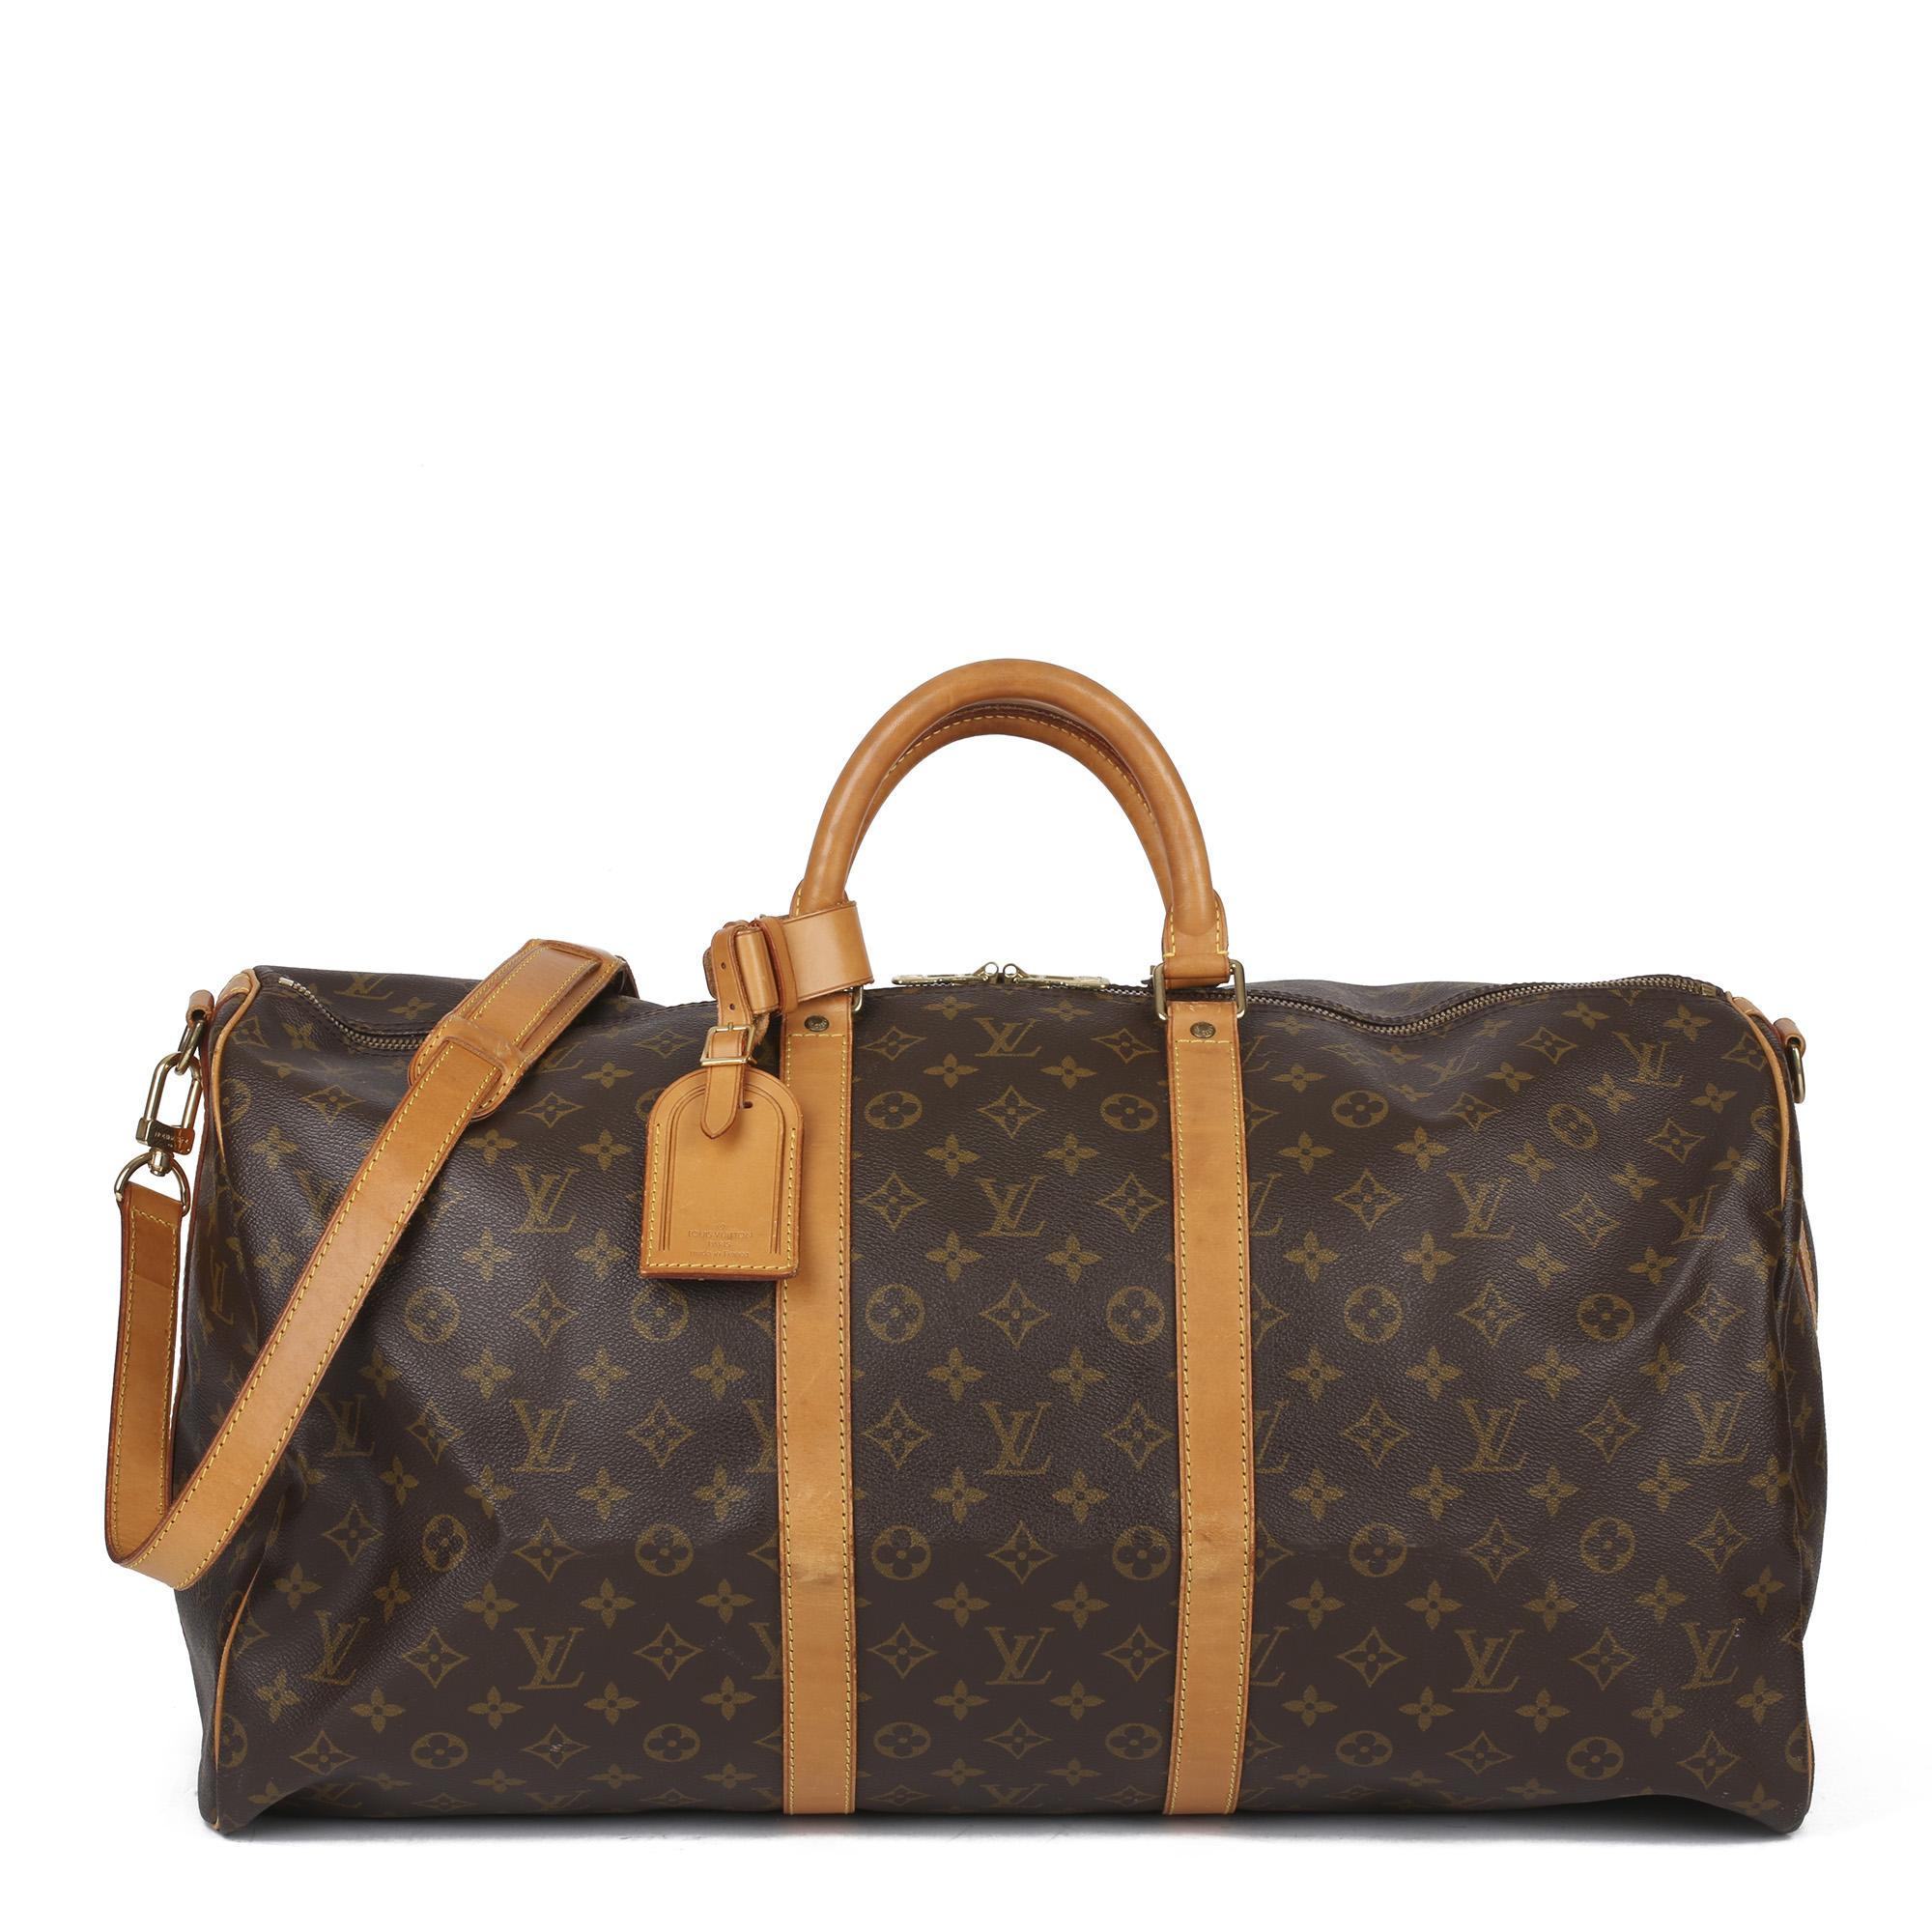 Louis Vuitton Brown Monogram Coated Canvas & Vachetta Leather Vintage Keepall 55 Bandoulire